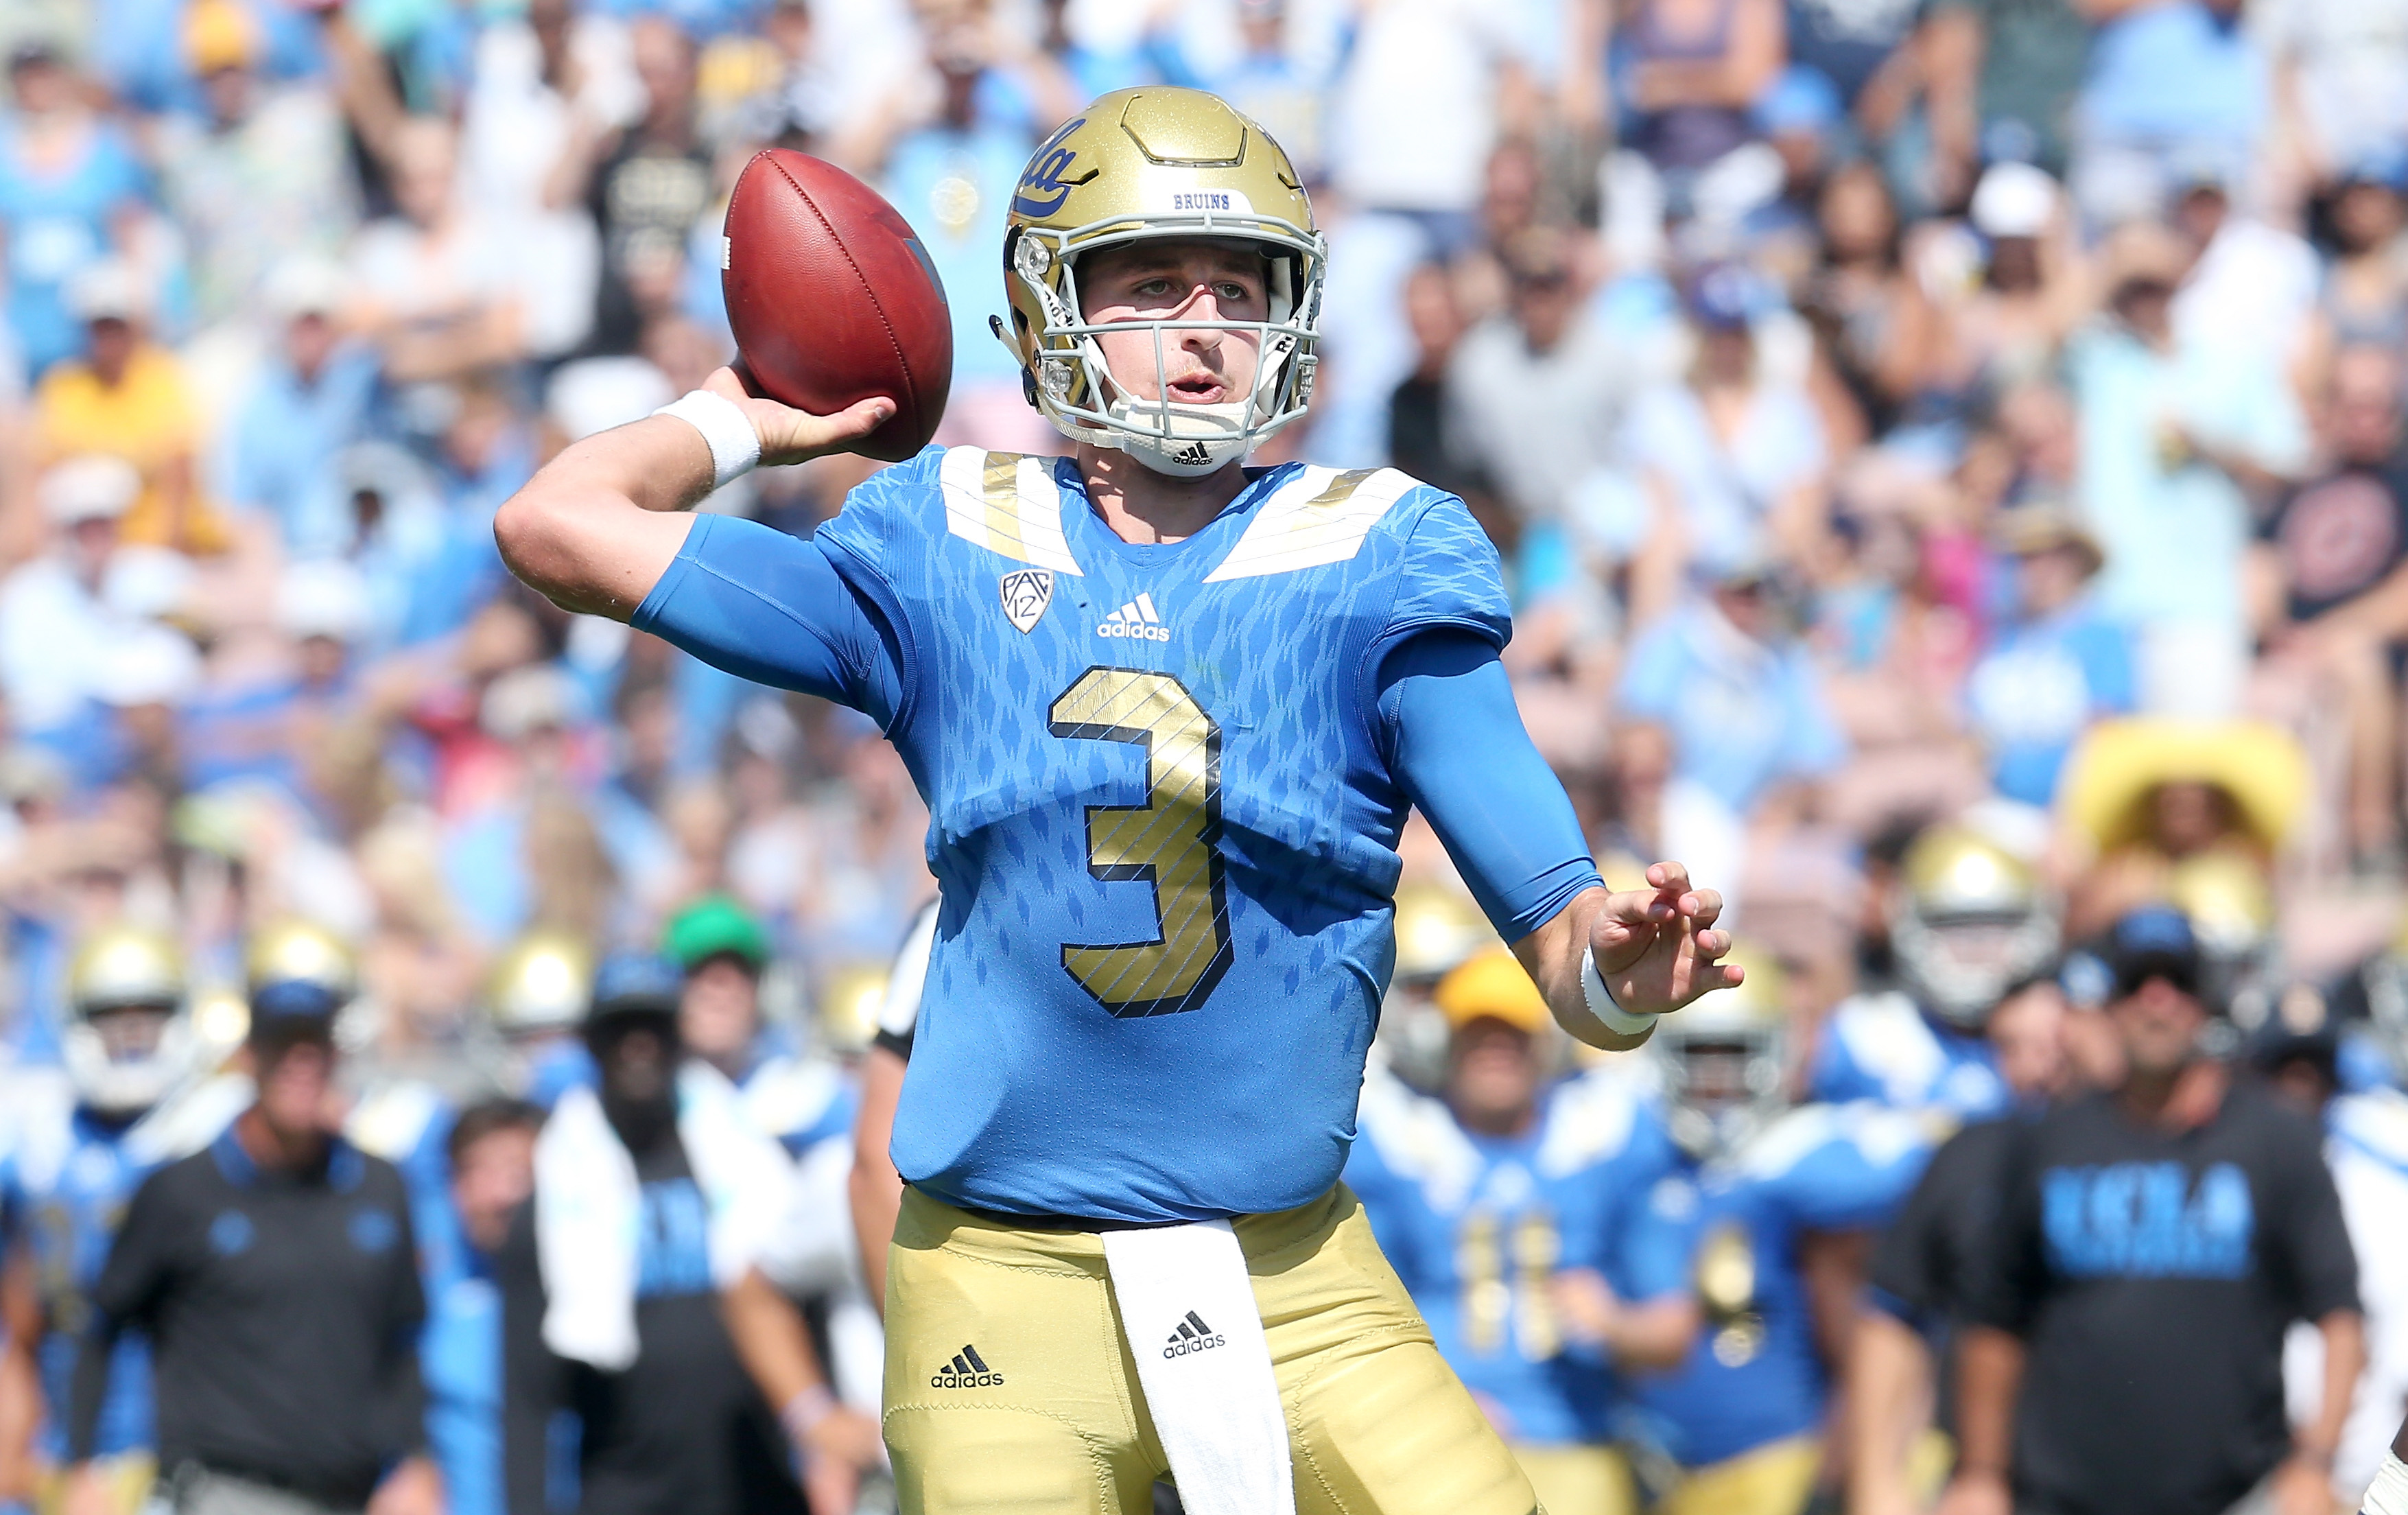 New UCLA